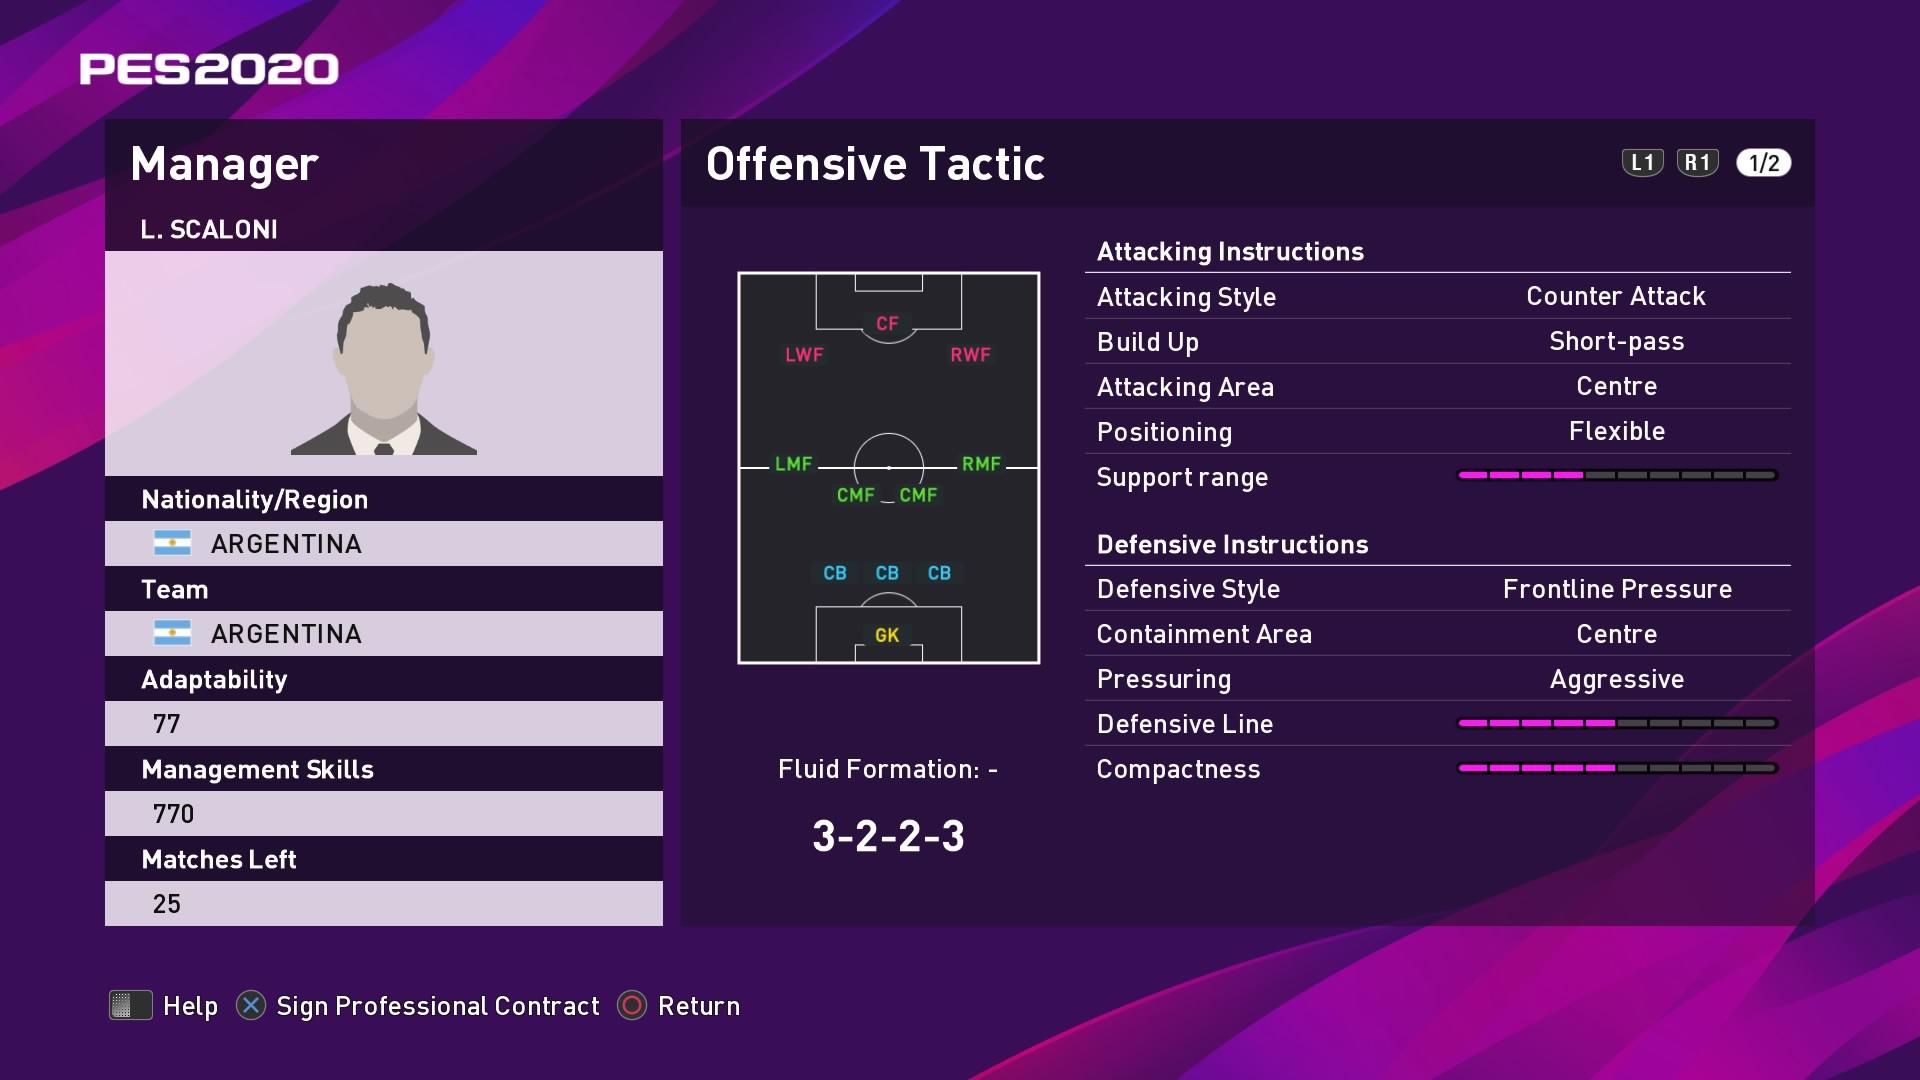 L. Scaloni ( Lionel Scaloni) Offensive Tactic in PES 2020 myClub